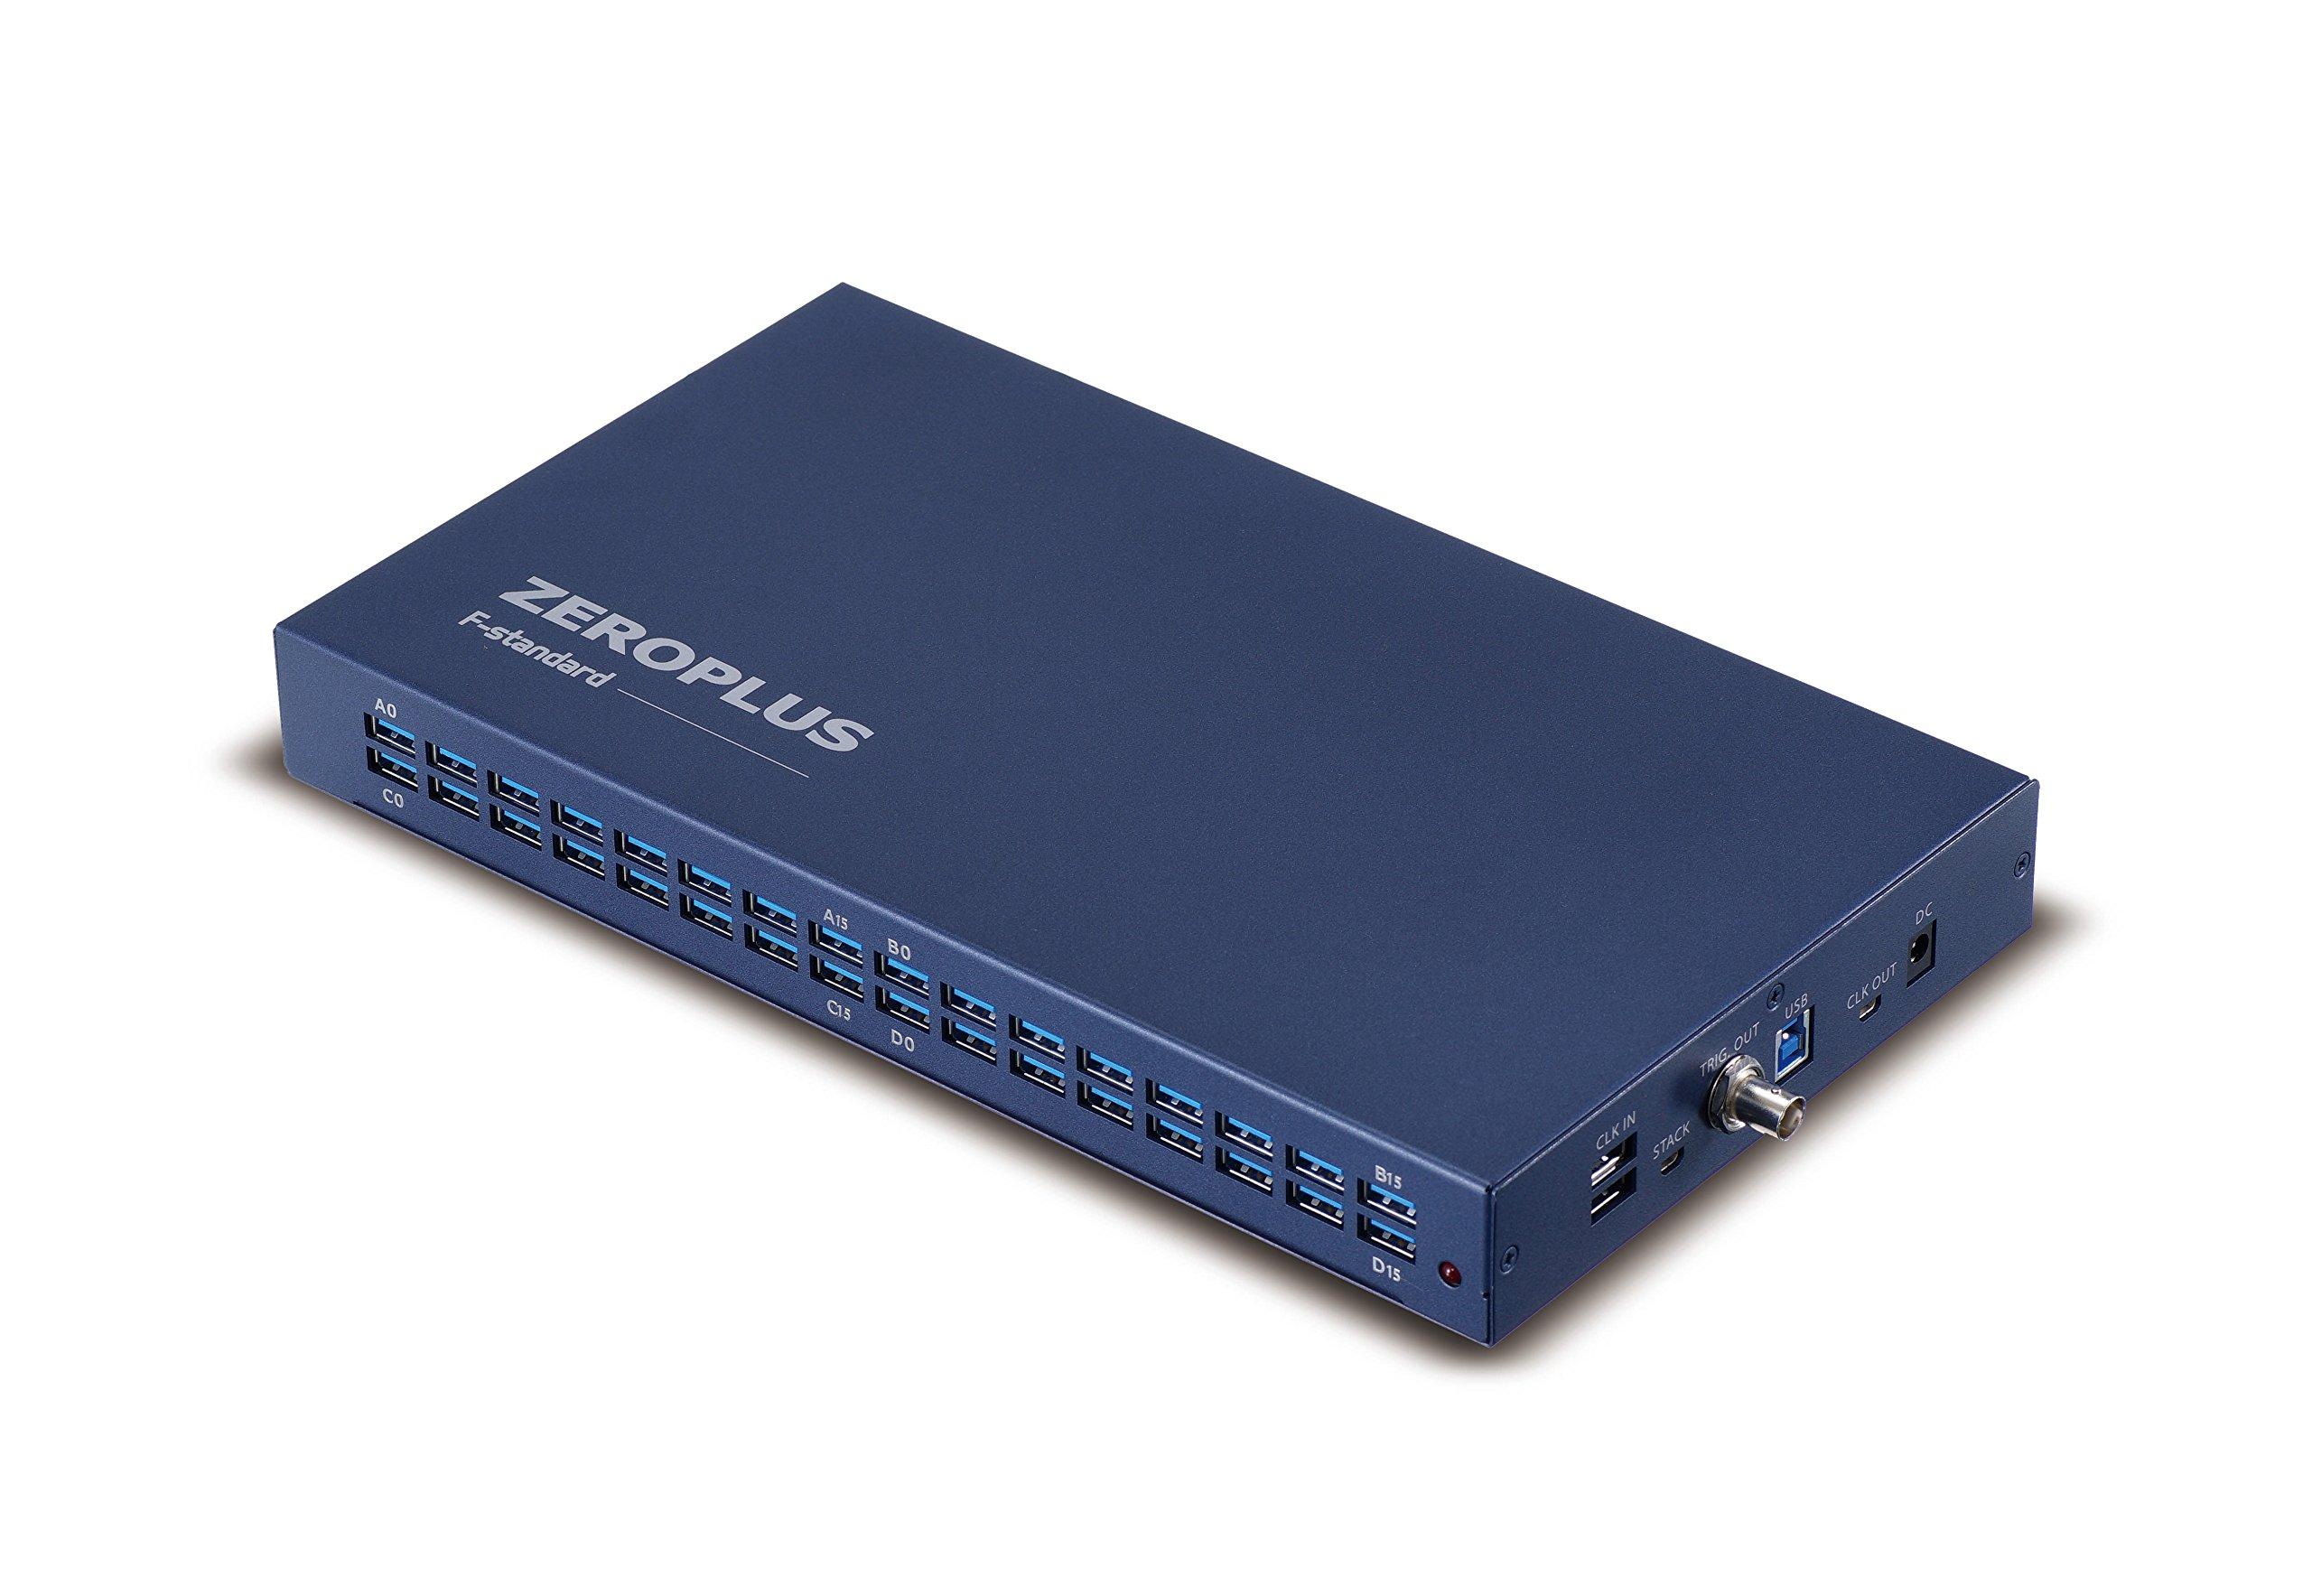 Zeroplus LAP-F1 40-channel 4Mb per channel 1GHz USB 3.0 (USB 2 compatible) Logic Analyzer eMMC 5.1 SD 3.0